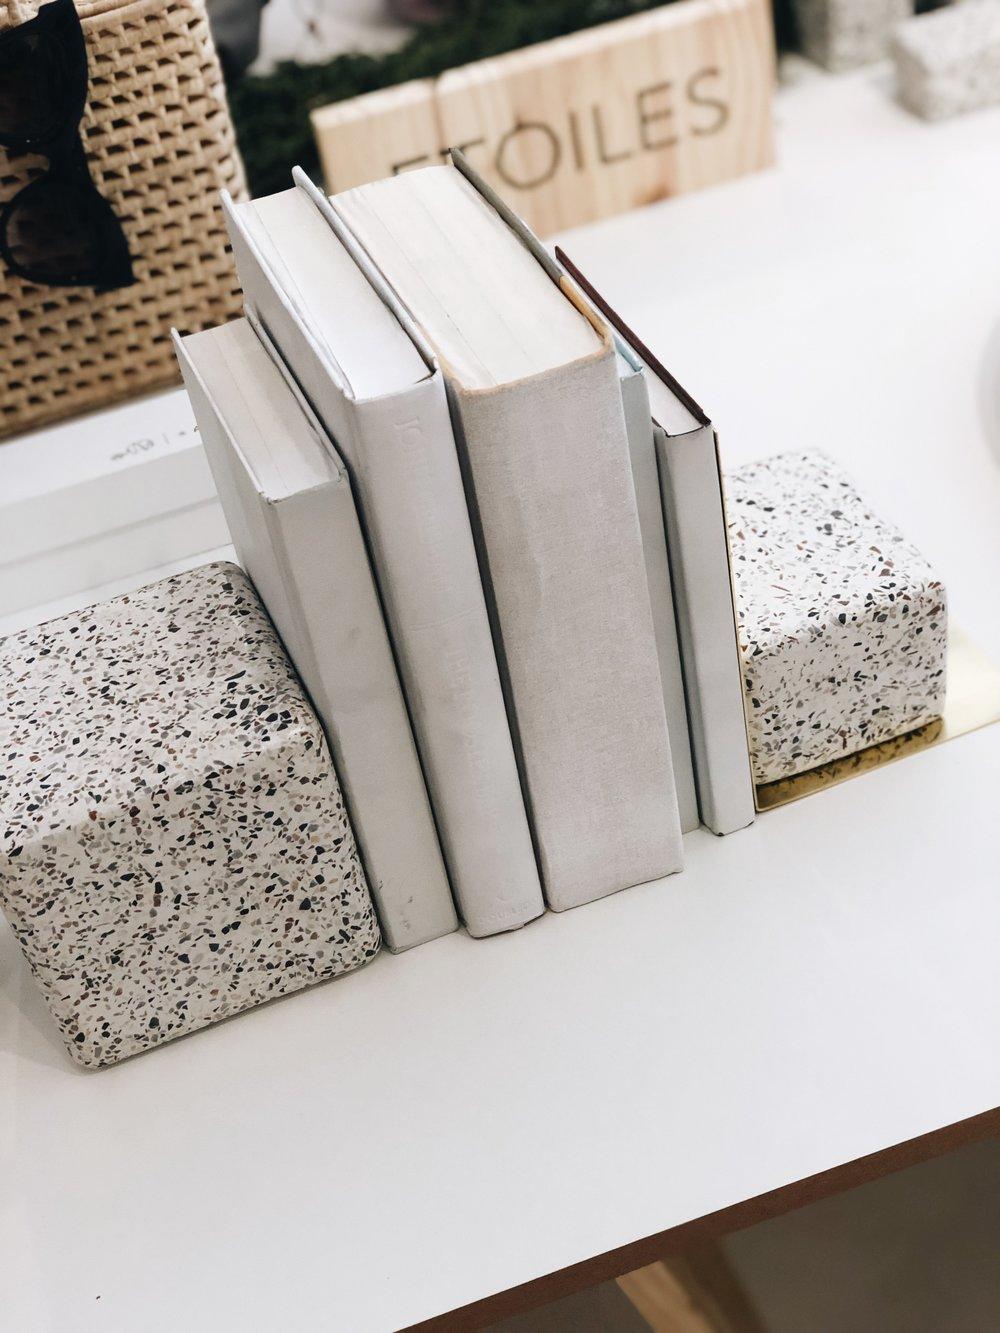 Porta livros da colar Etoiles + Estudio Prole